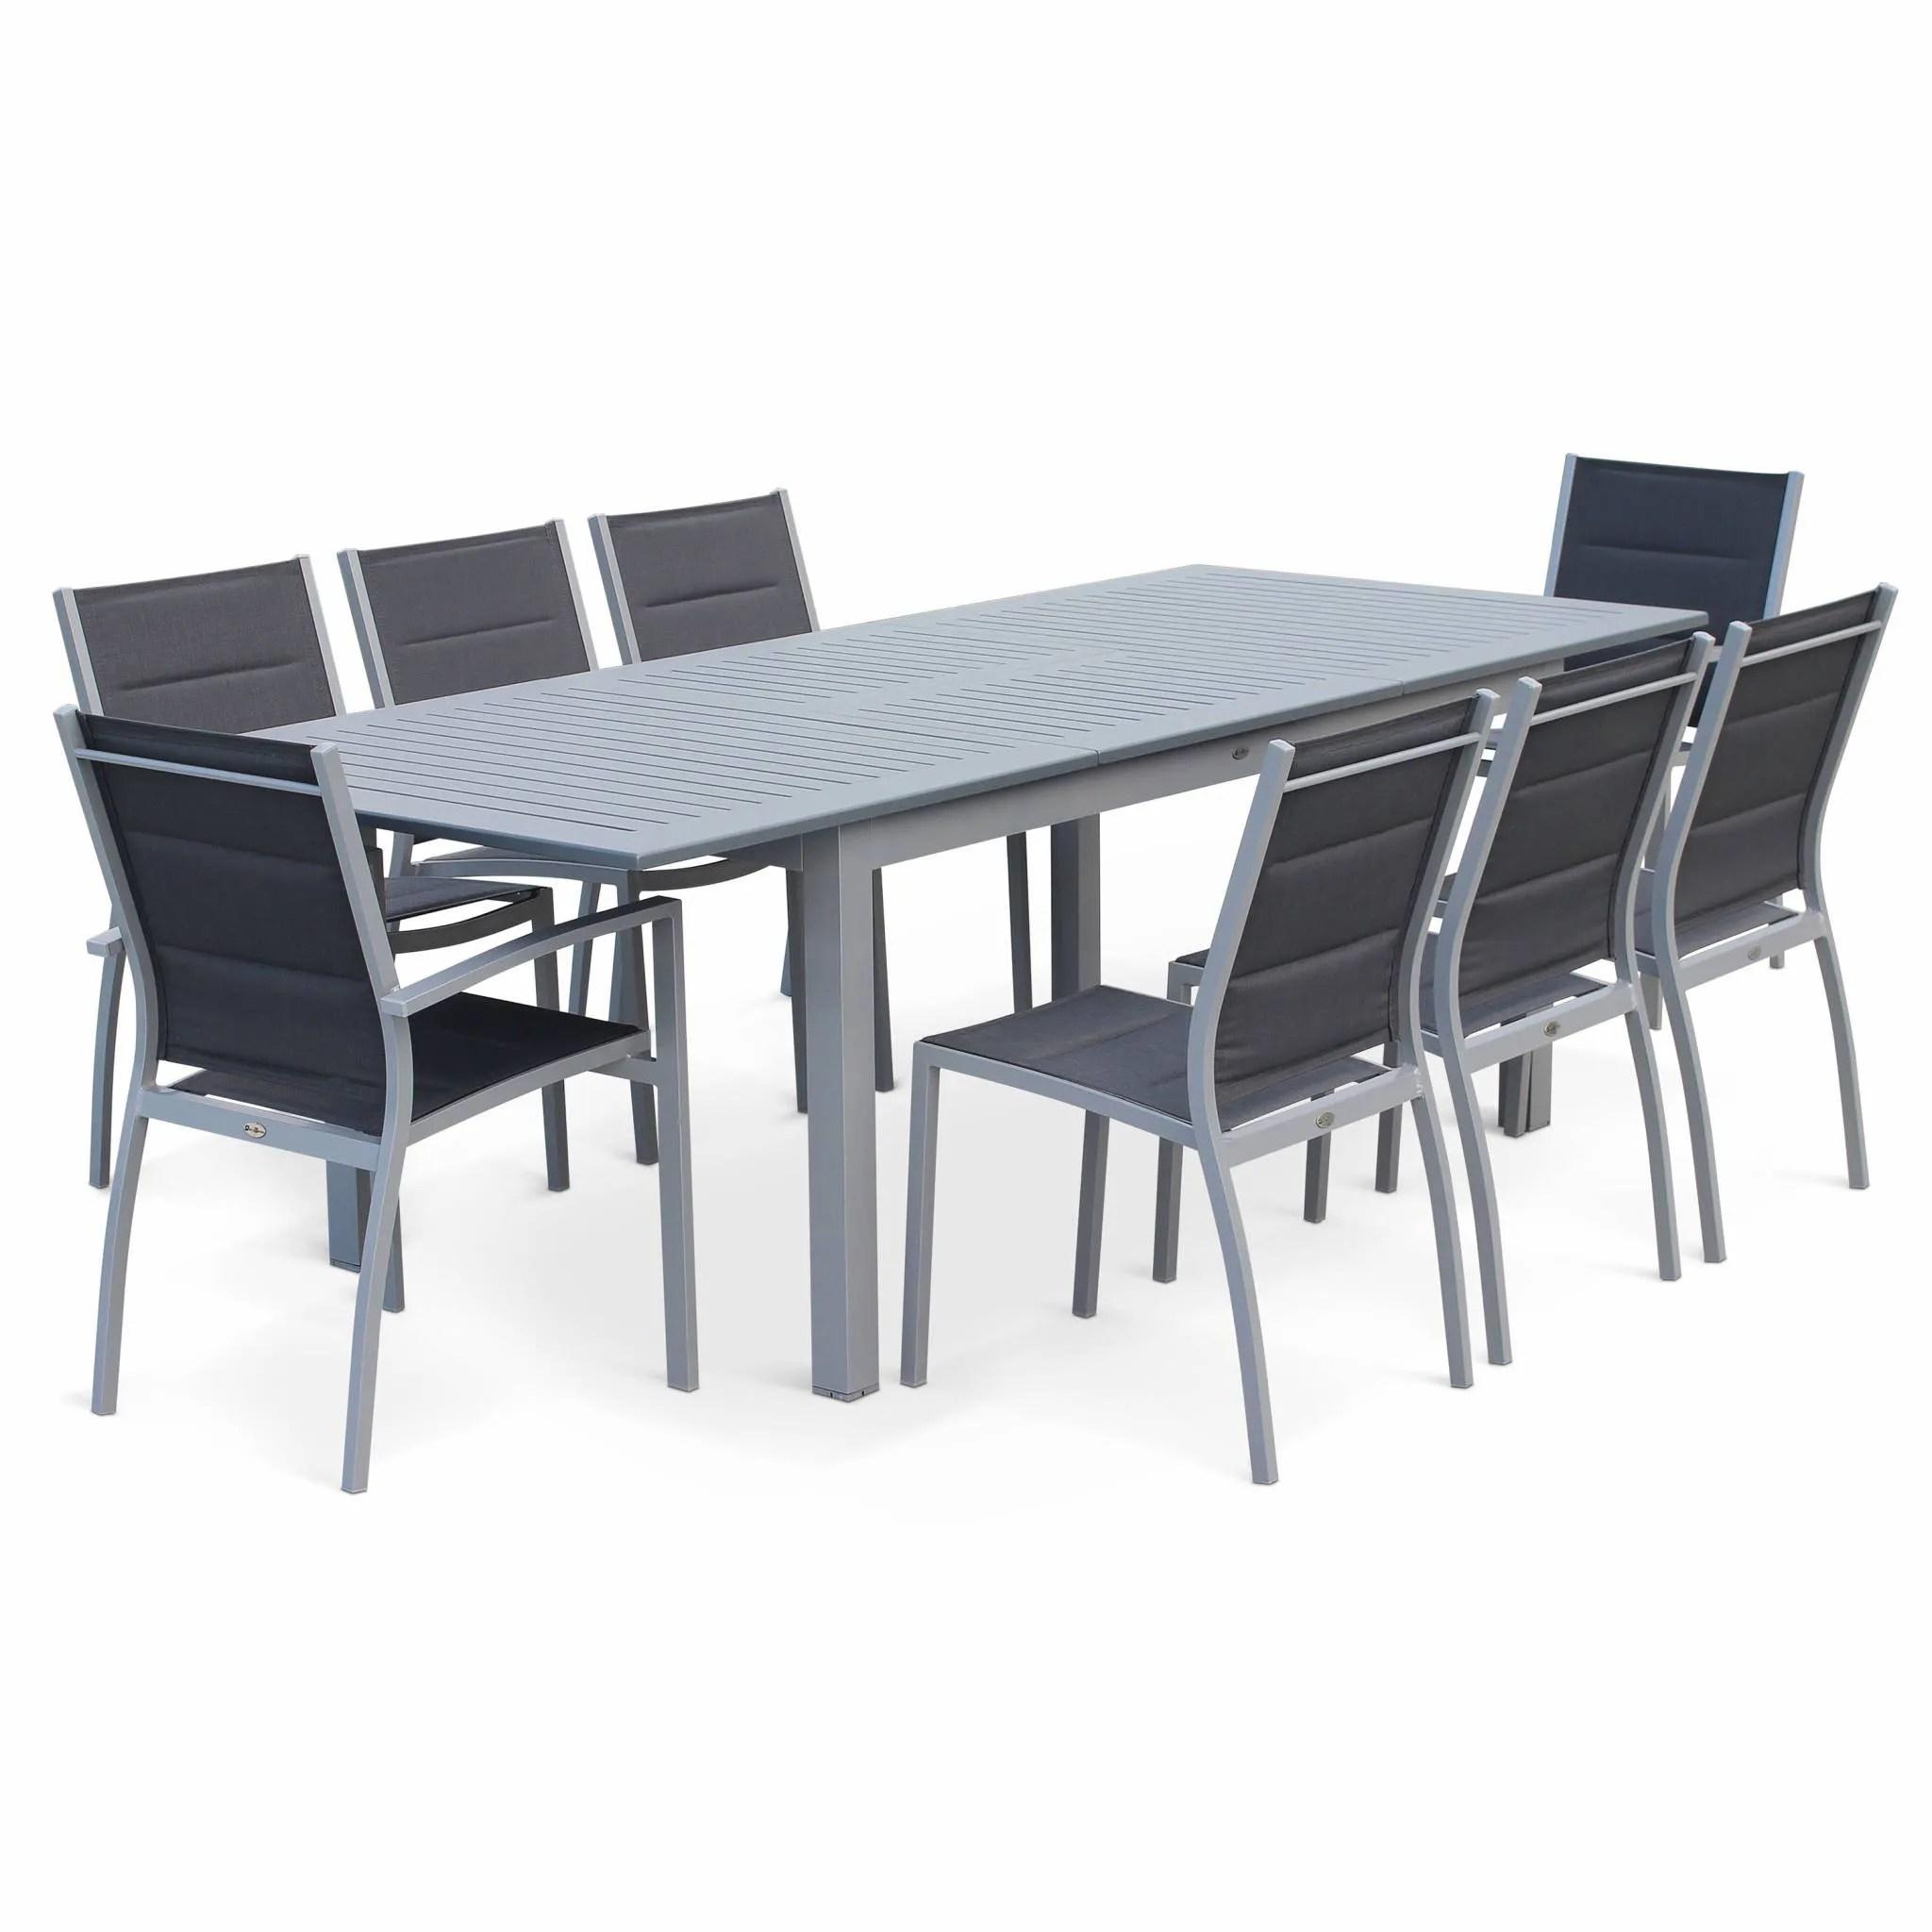 salon de jardin 8 places table a